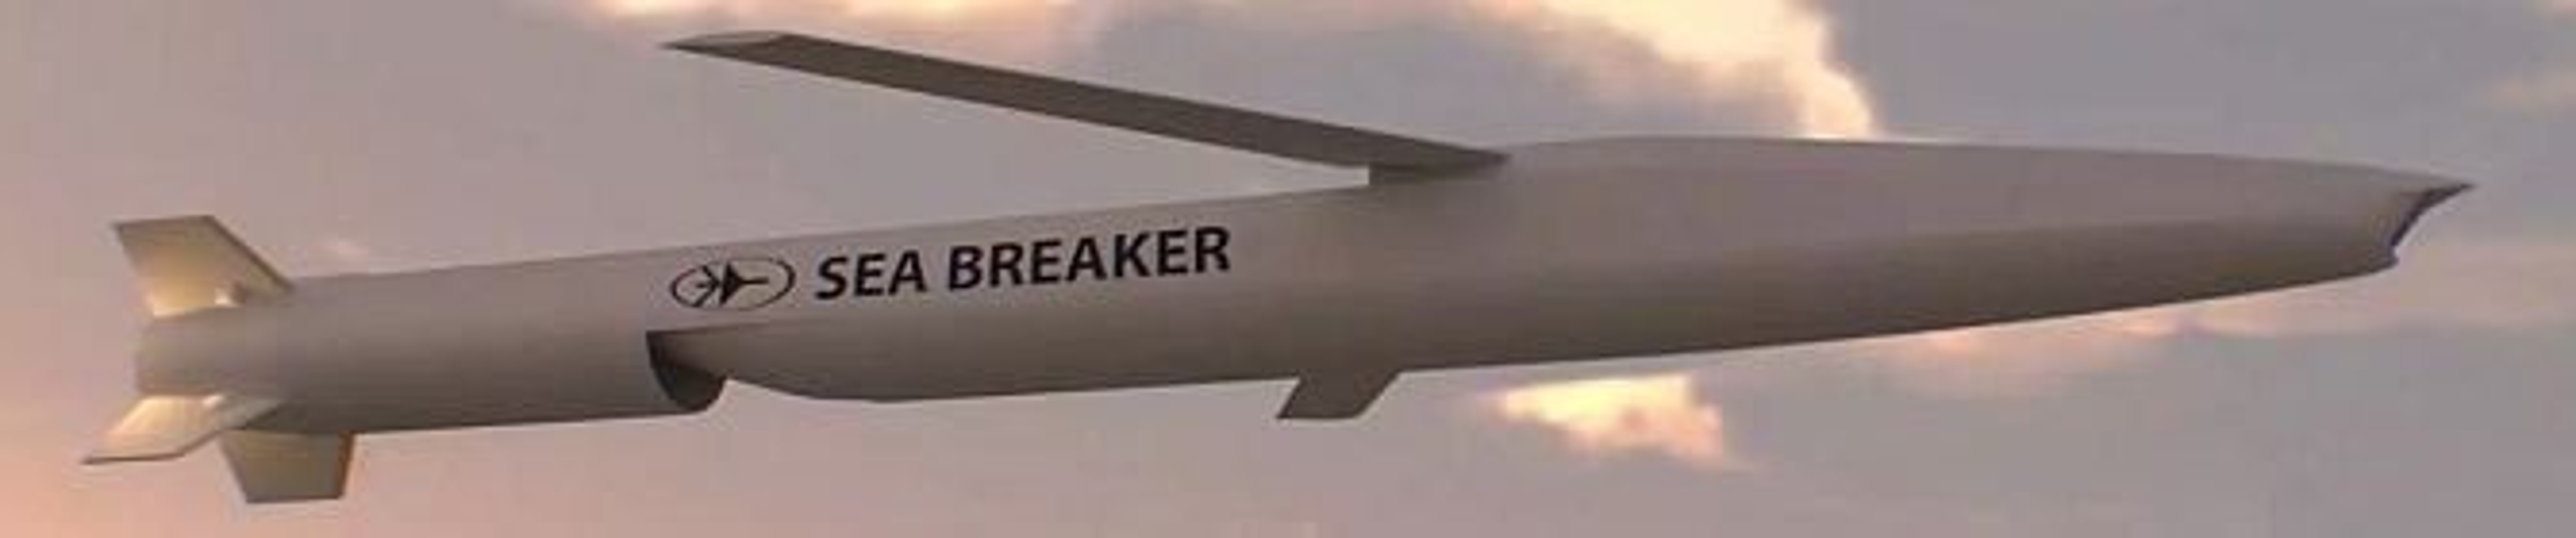 "Ten lua ""Sea Breaker"" cua Israel lieu co phu hop voi VIet Nam-Hinh-9"